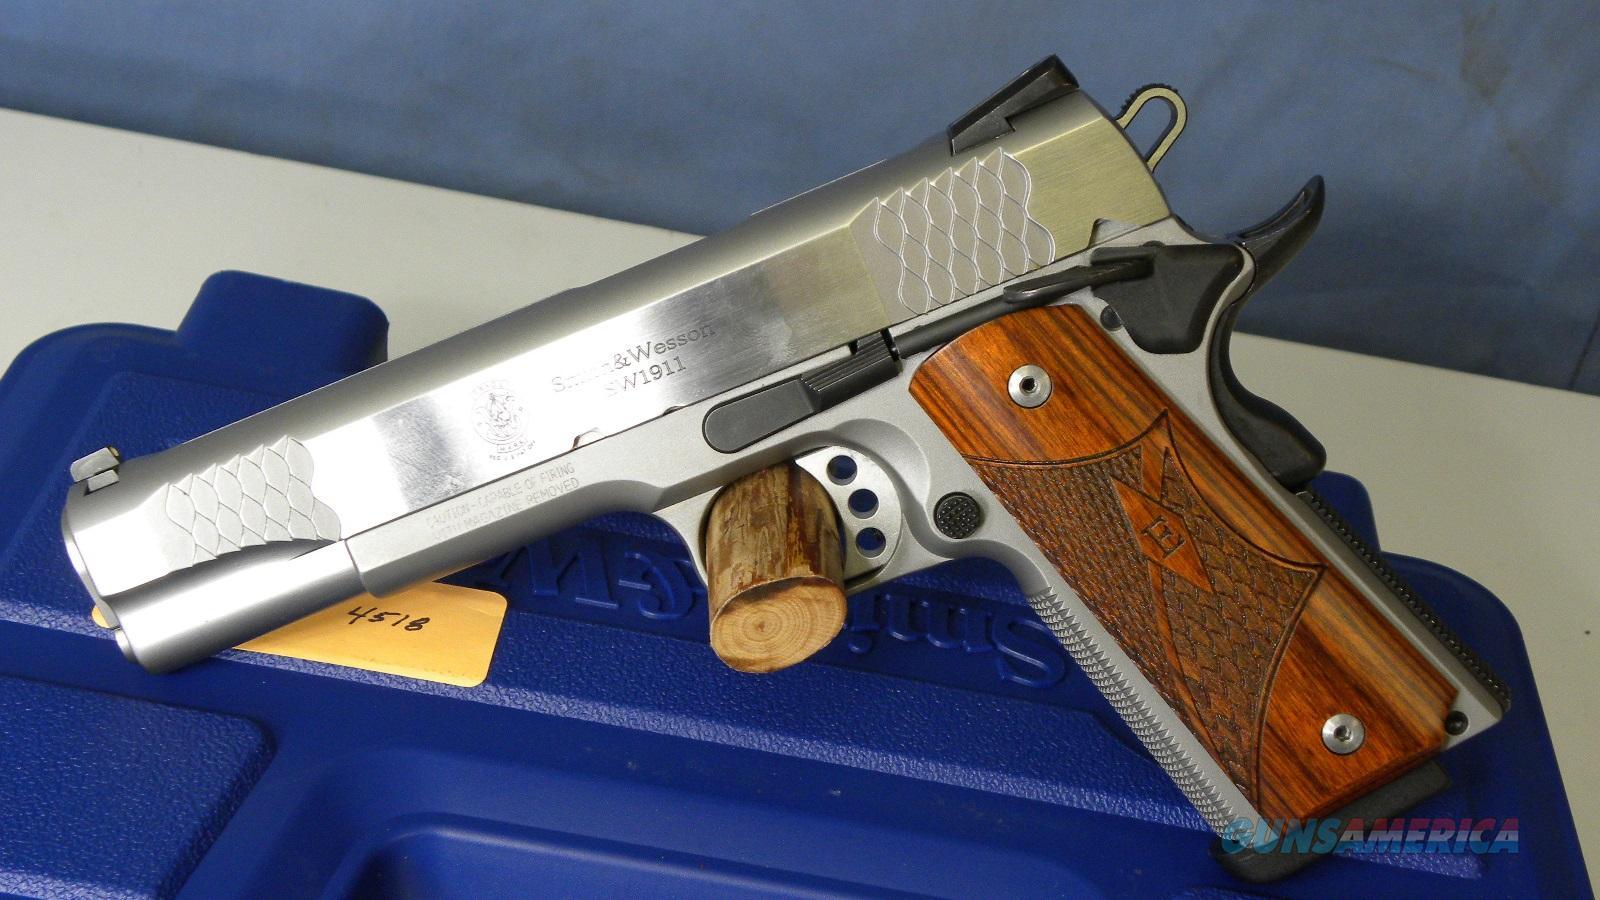 S&W 1911 E Series SS 108482  Guns > Pistols > Smith & Wesson Pistols - Autos > Steel Frame